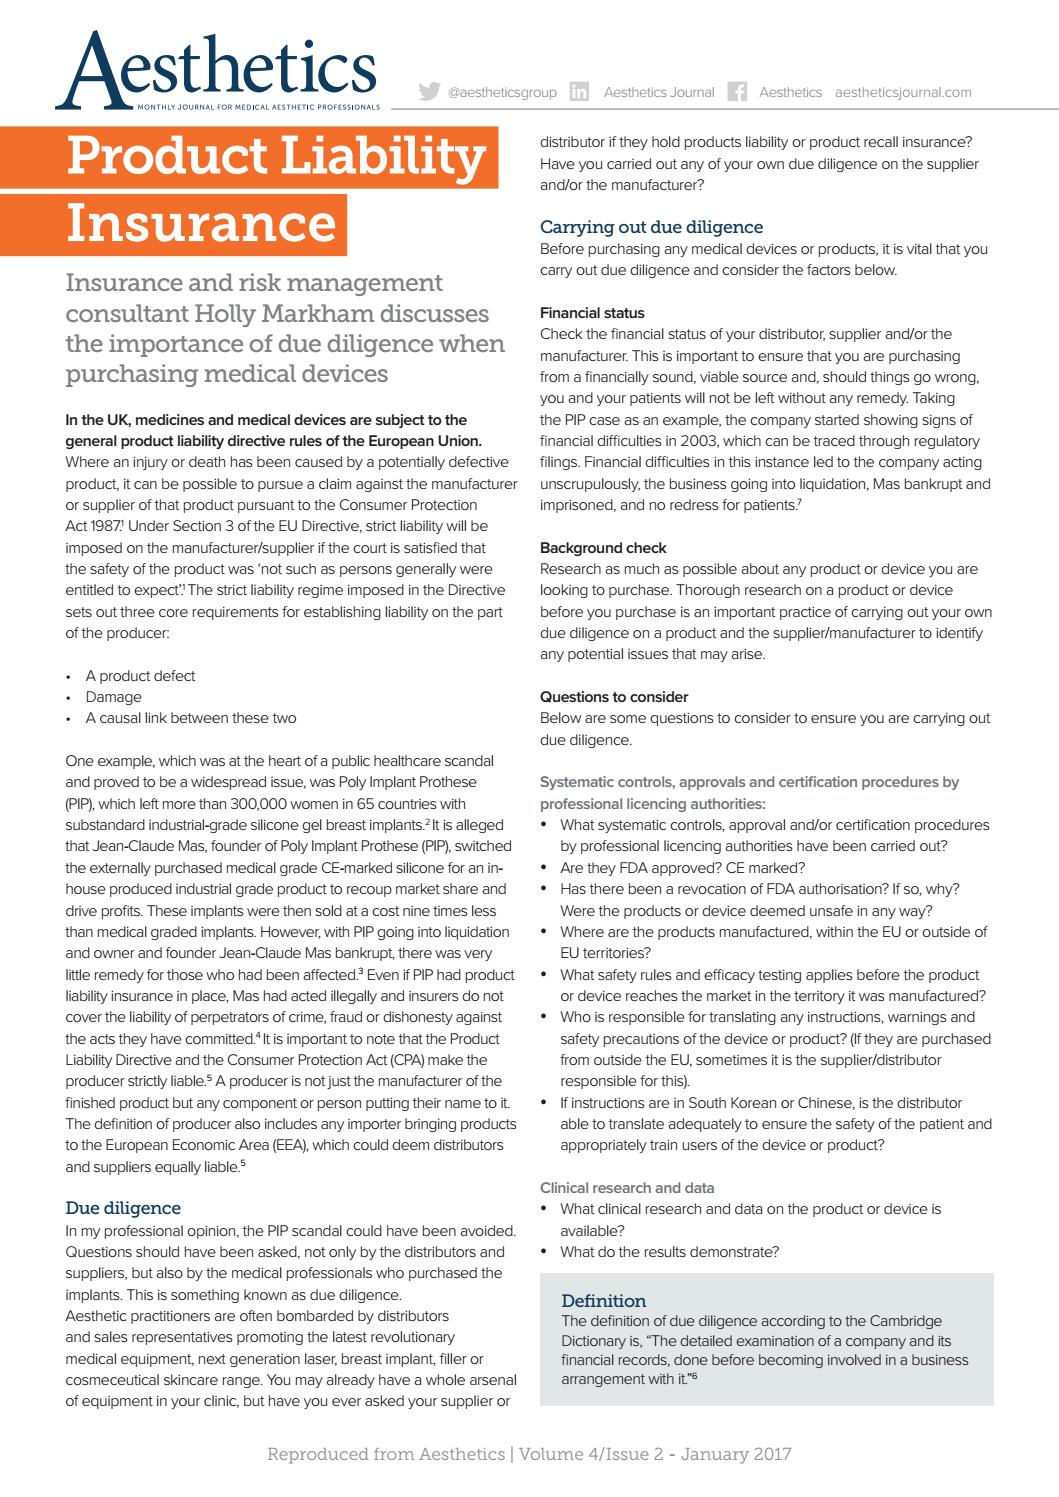 Aesthetics January 2017 by Aesthetics Journal - issuu